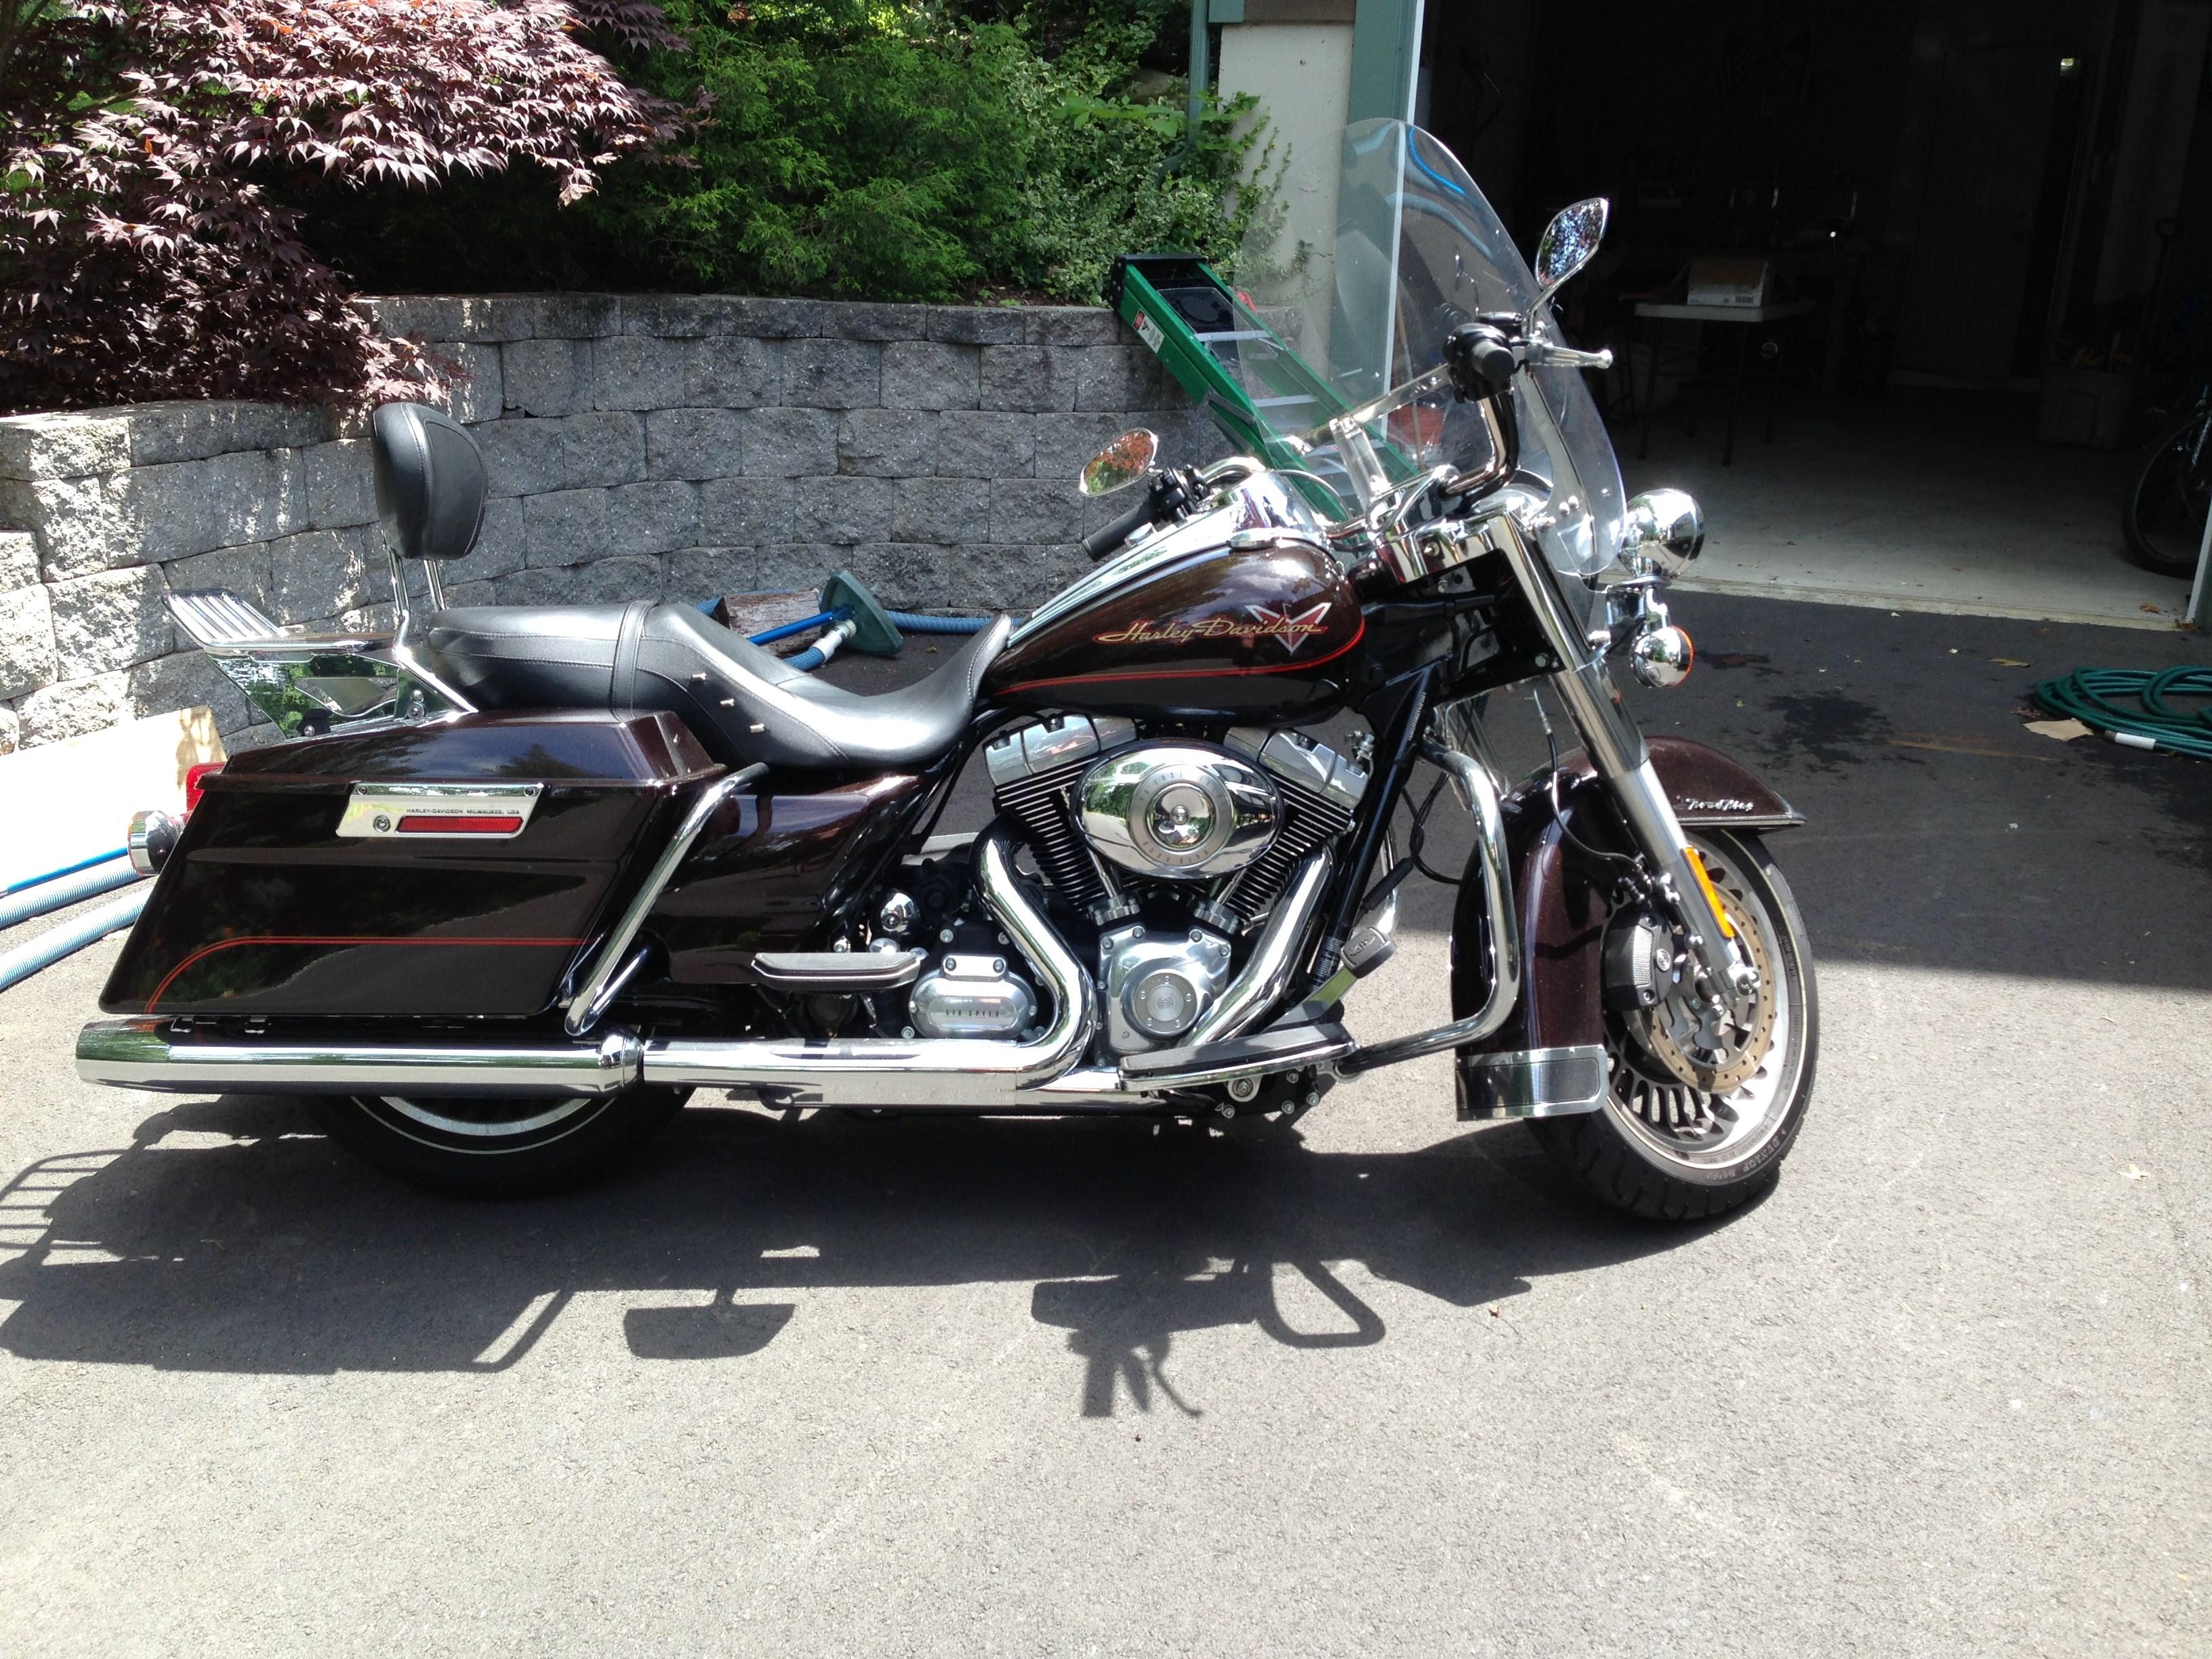 2011 Harley Davidson 174 Flhr Road King 174 Merlot Black